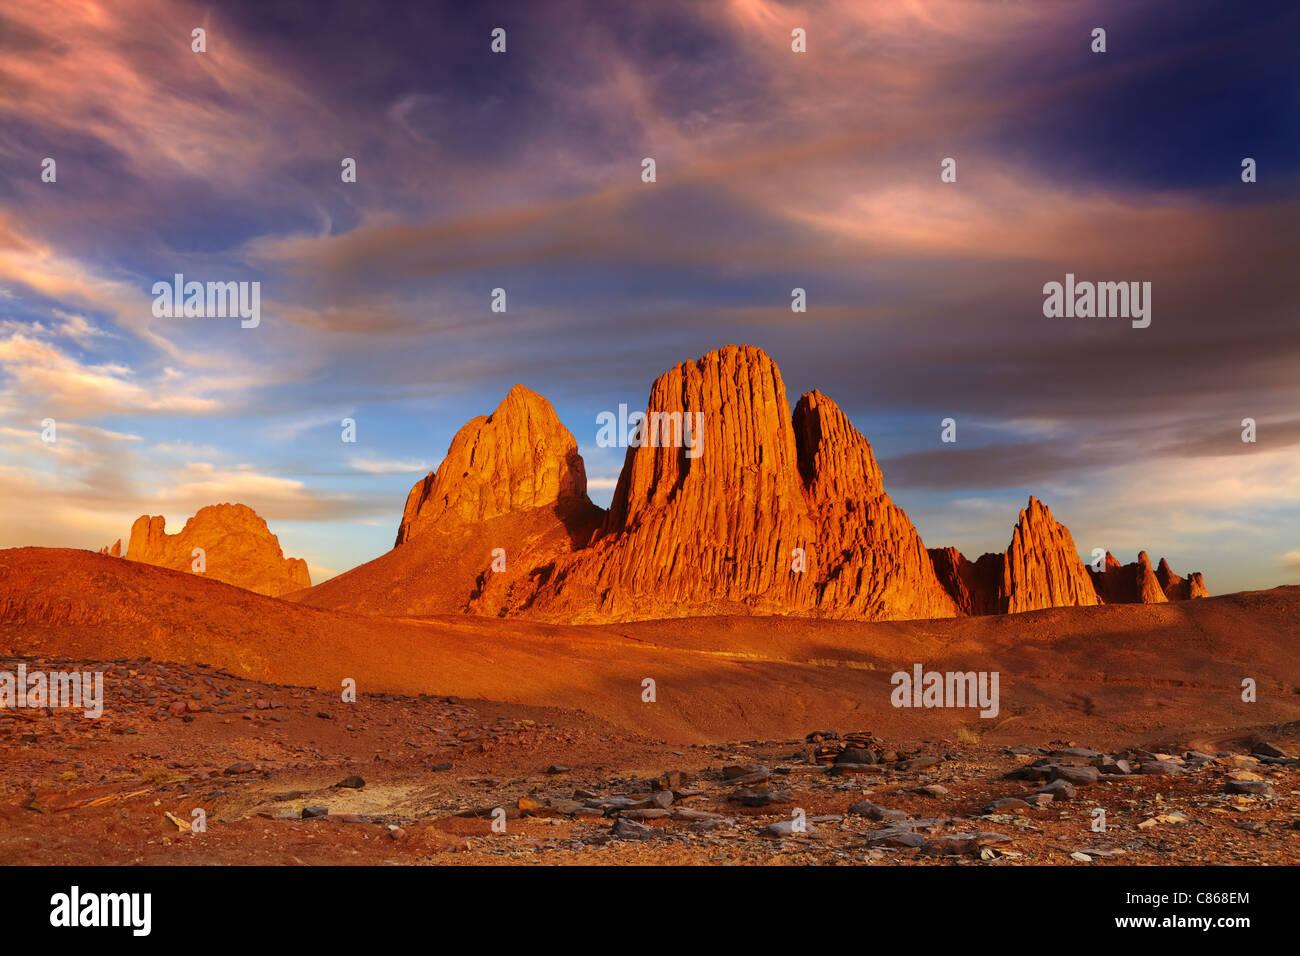 Sonnenuntergang in der Wüste Sahara, Algerien Hoggar Gebirge Stockbild